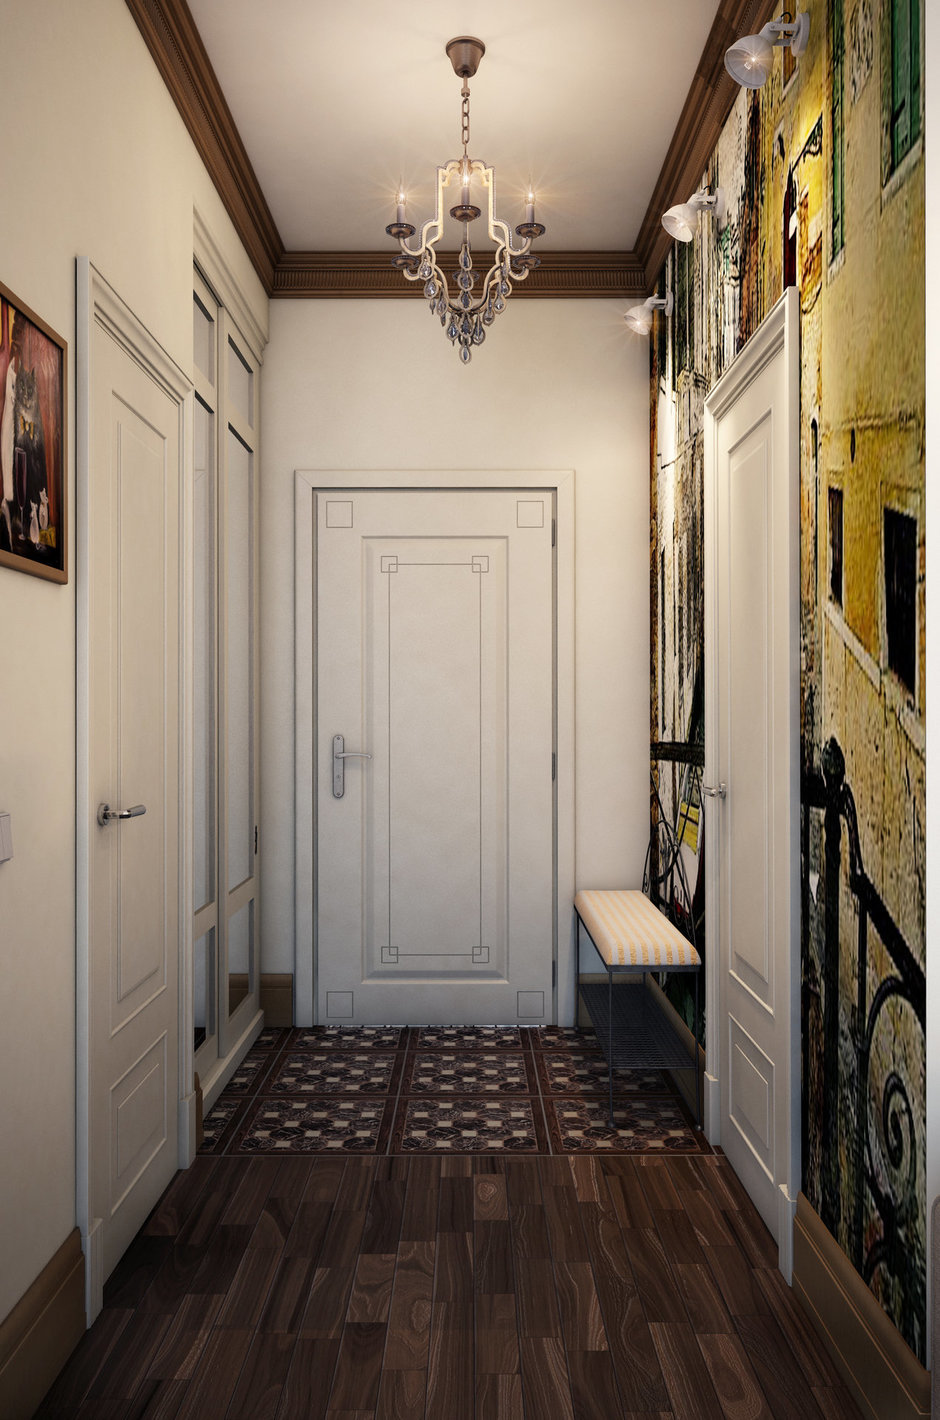 Фотография: Прихожая в стиле Прованс и Кантри, Классический, Квартира, Проект недели – фото на InMyRoom.ru